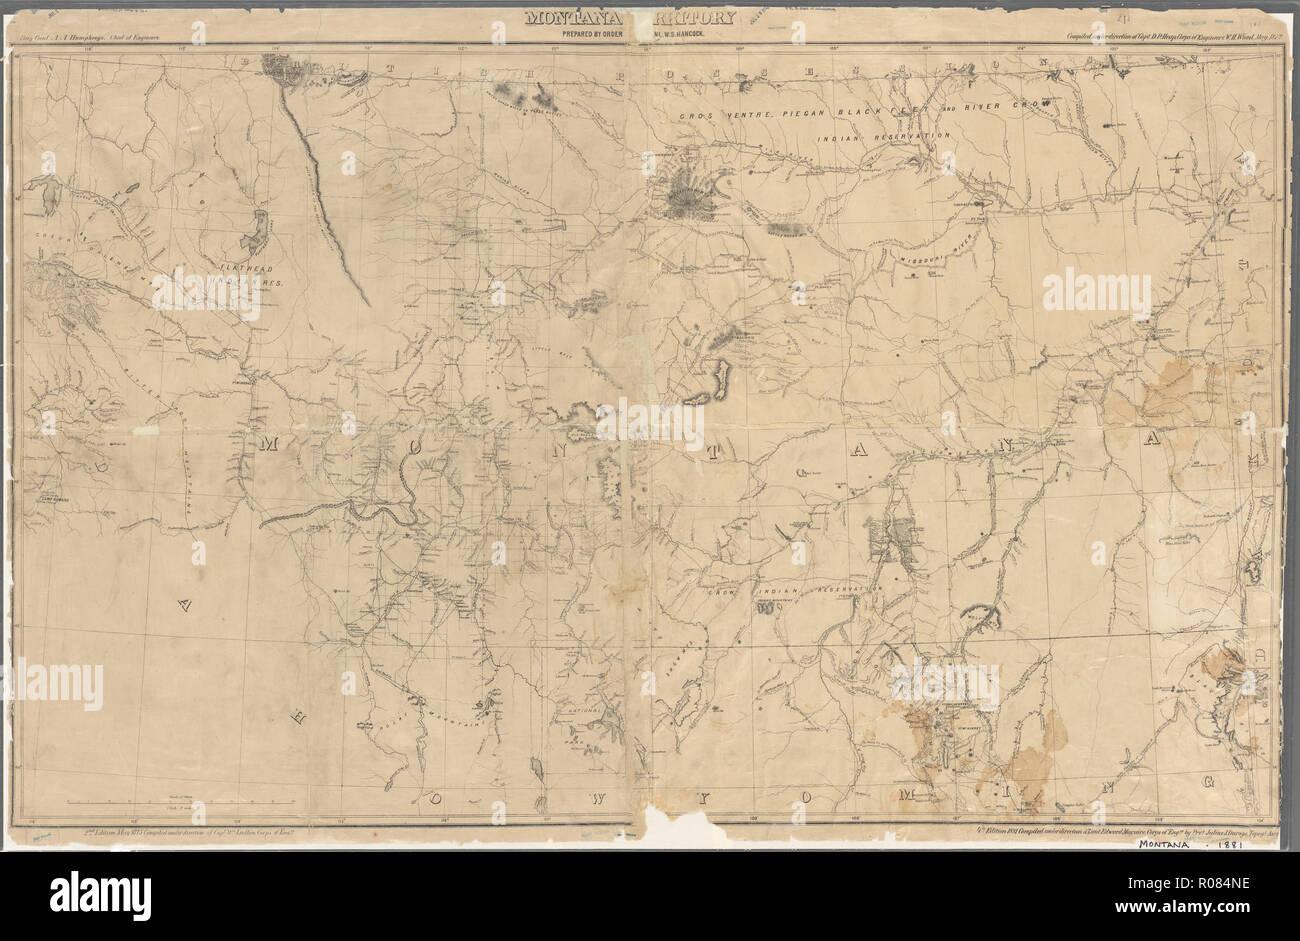 Vintage U S Maps Stockfotos & Vintage U S Maps Bilder - Alamy